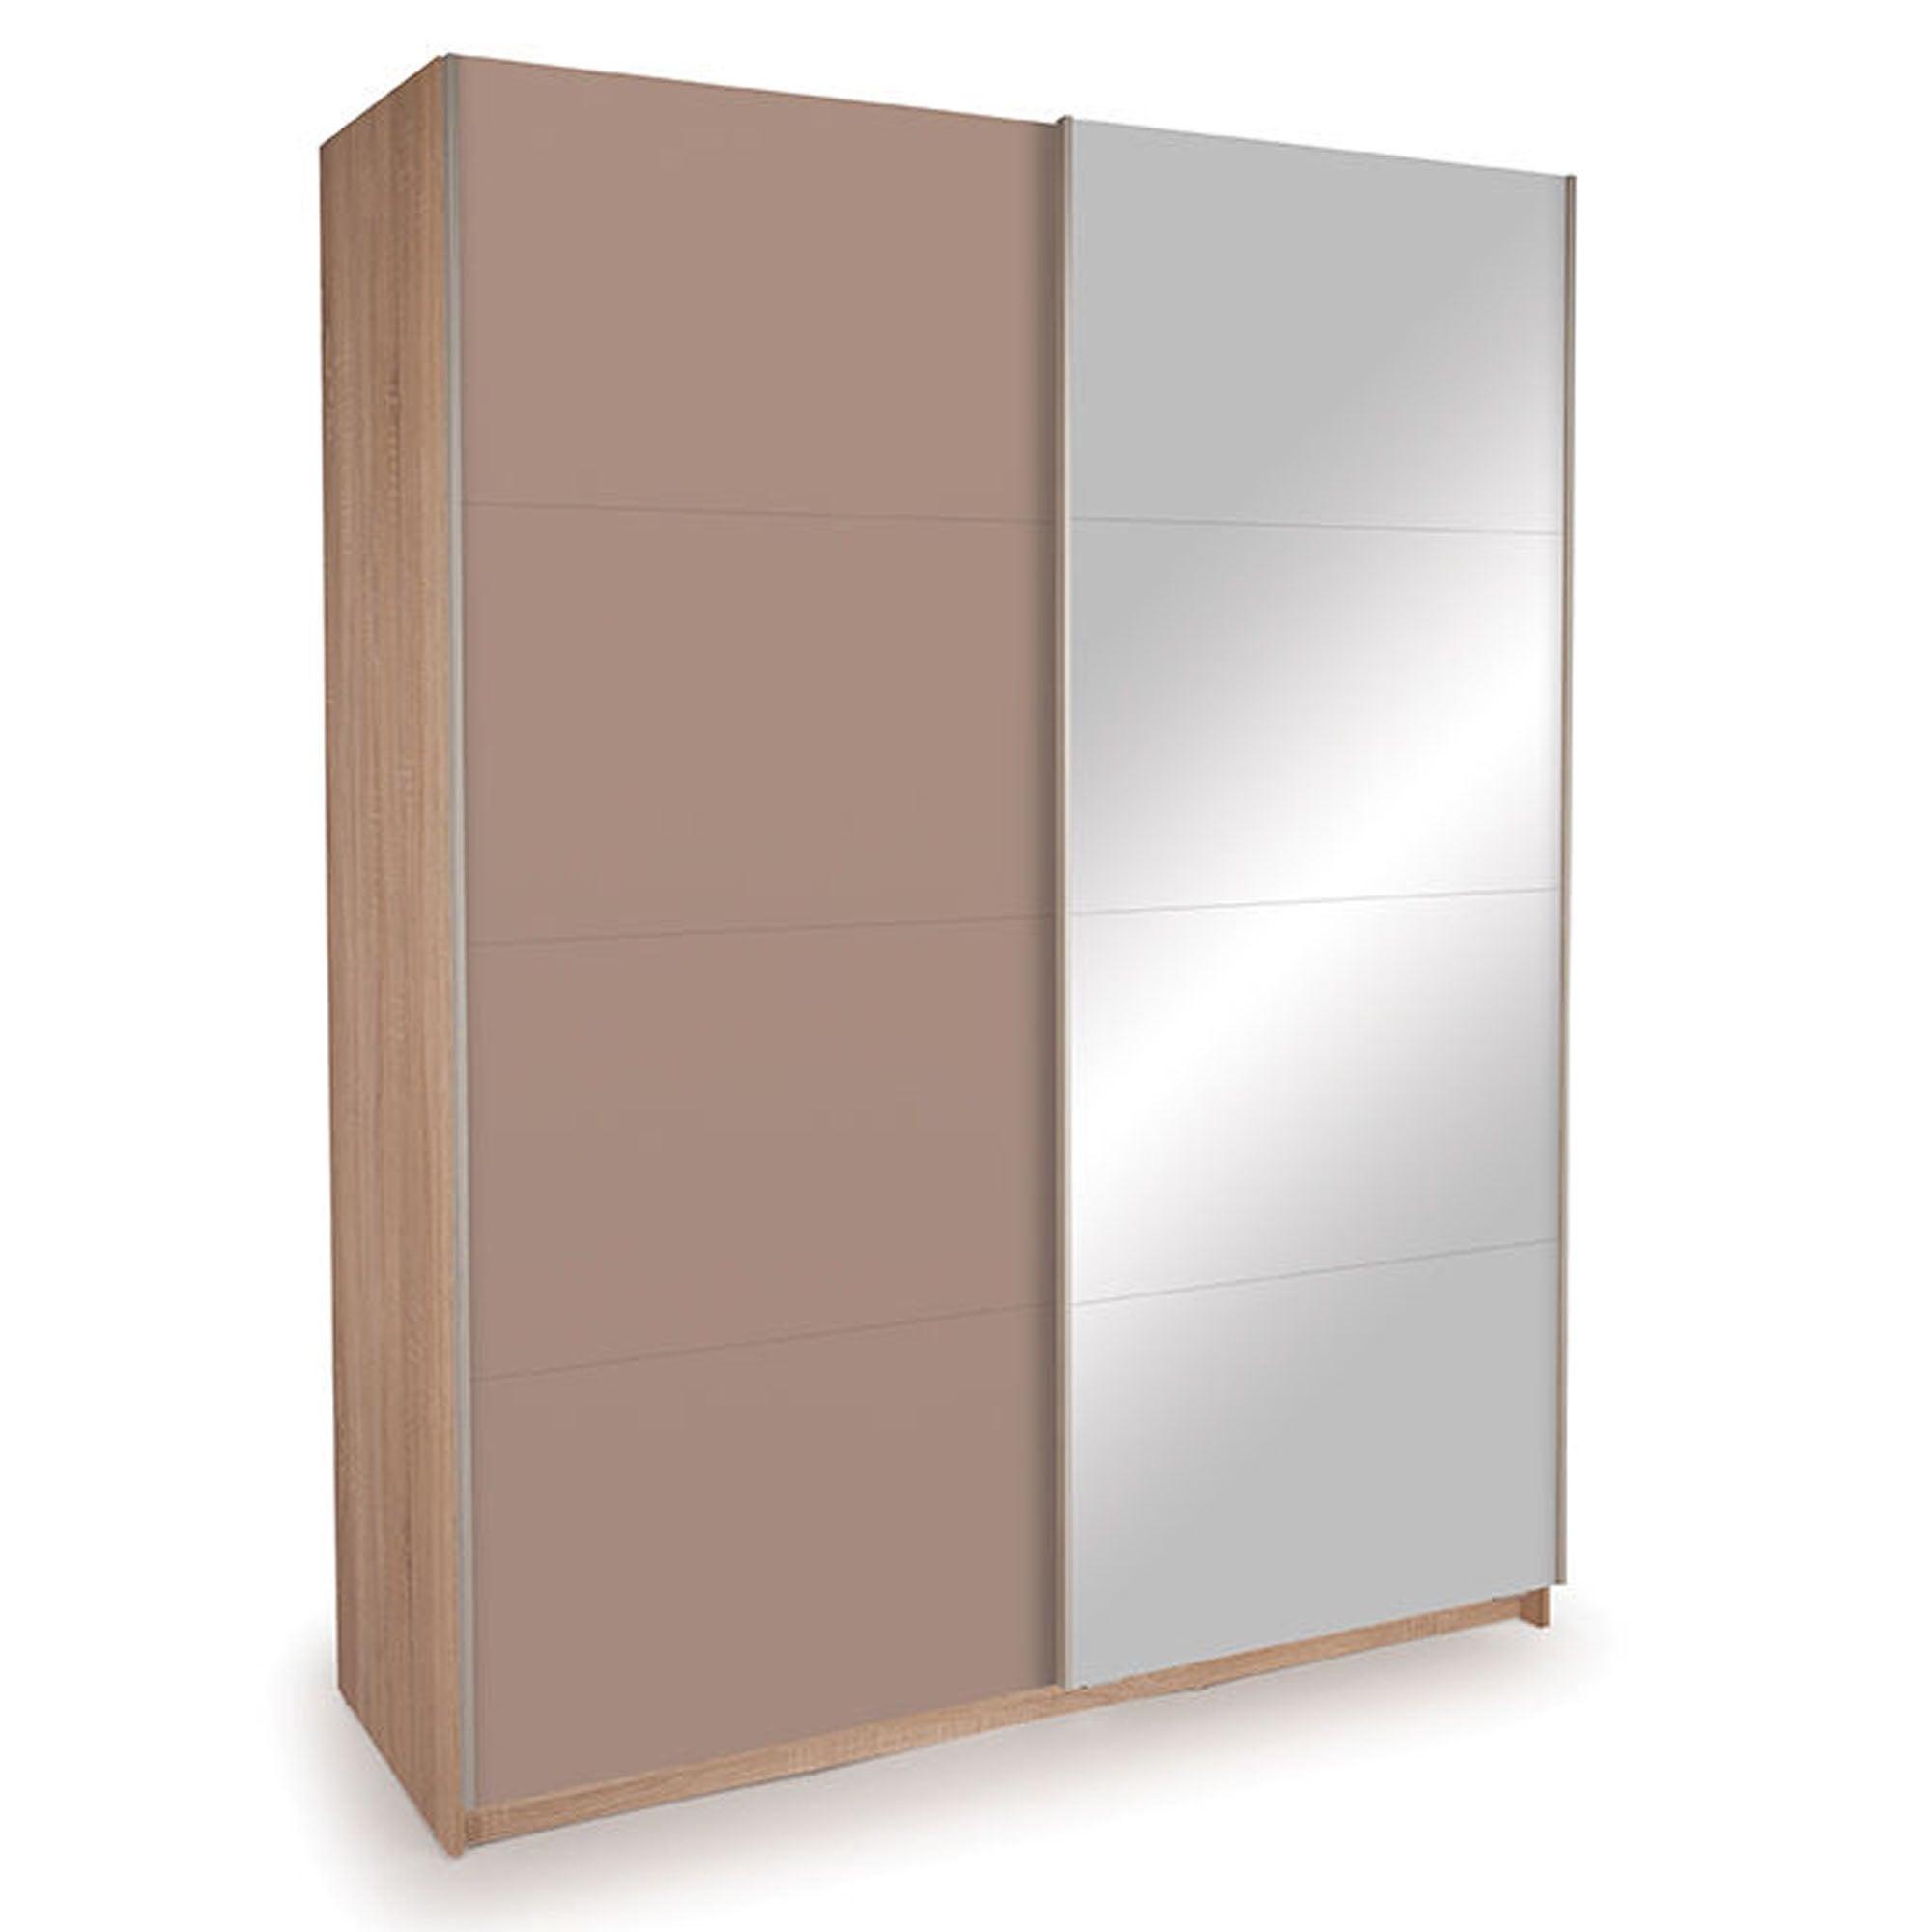 Photo of Ellum natural mirrored sliding wardrobe putty -natural-